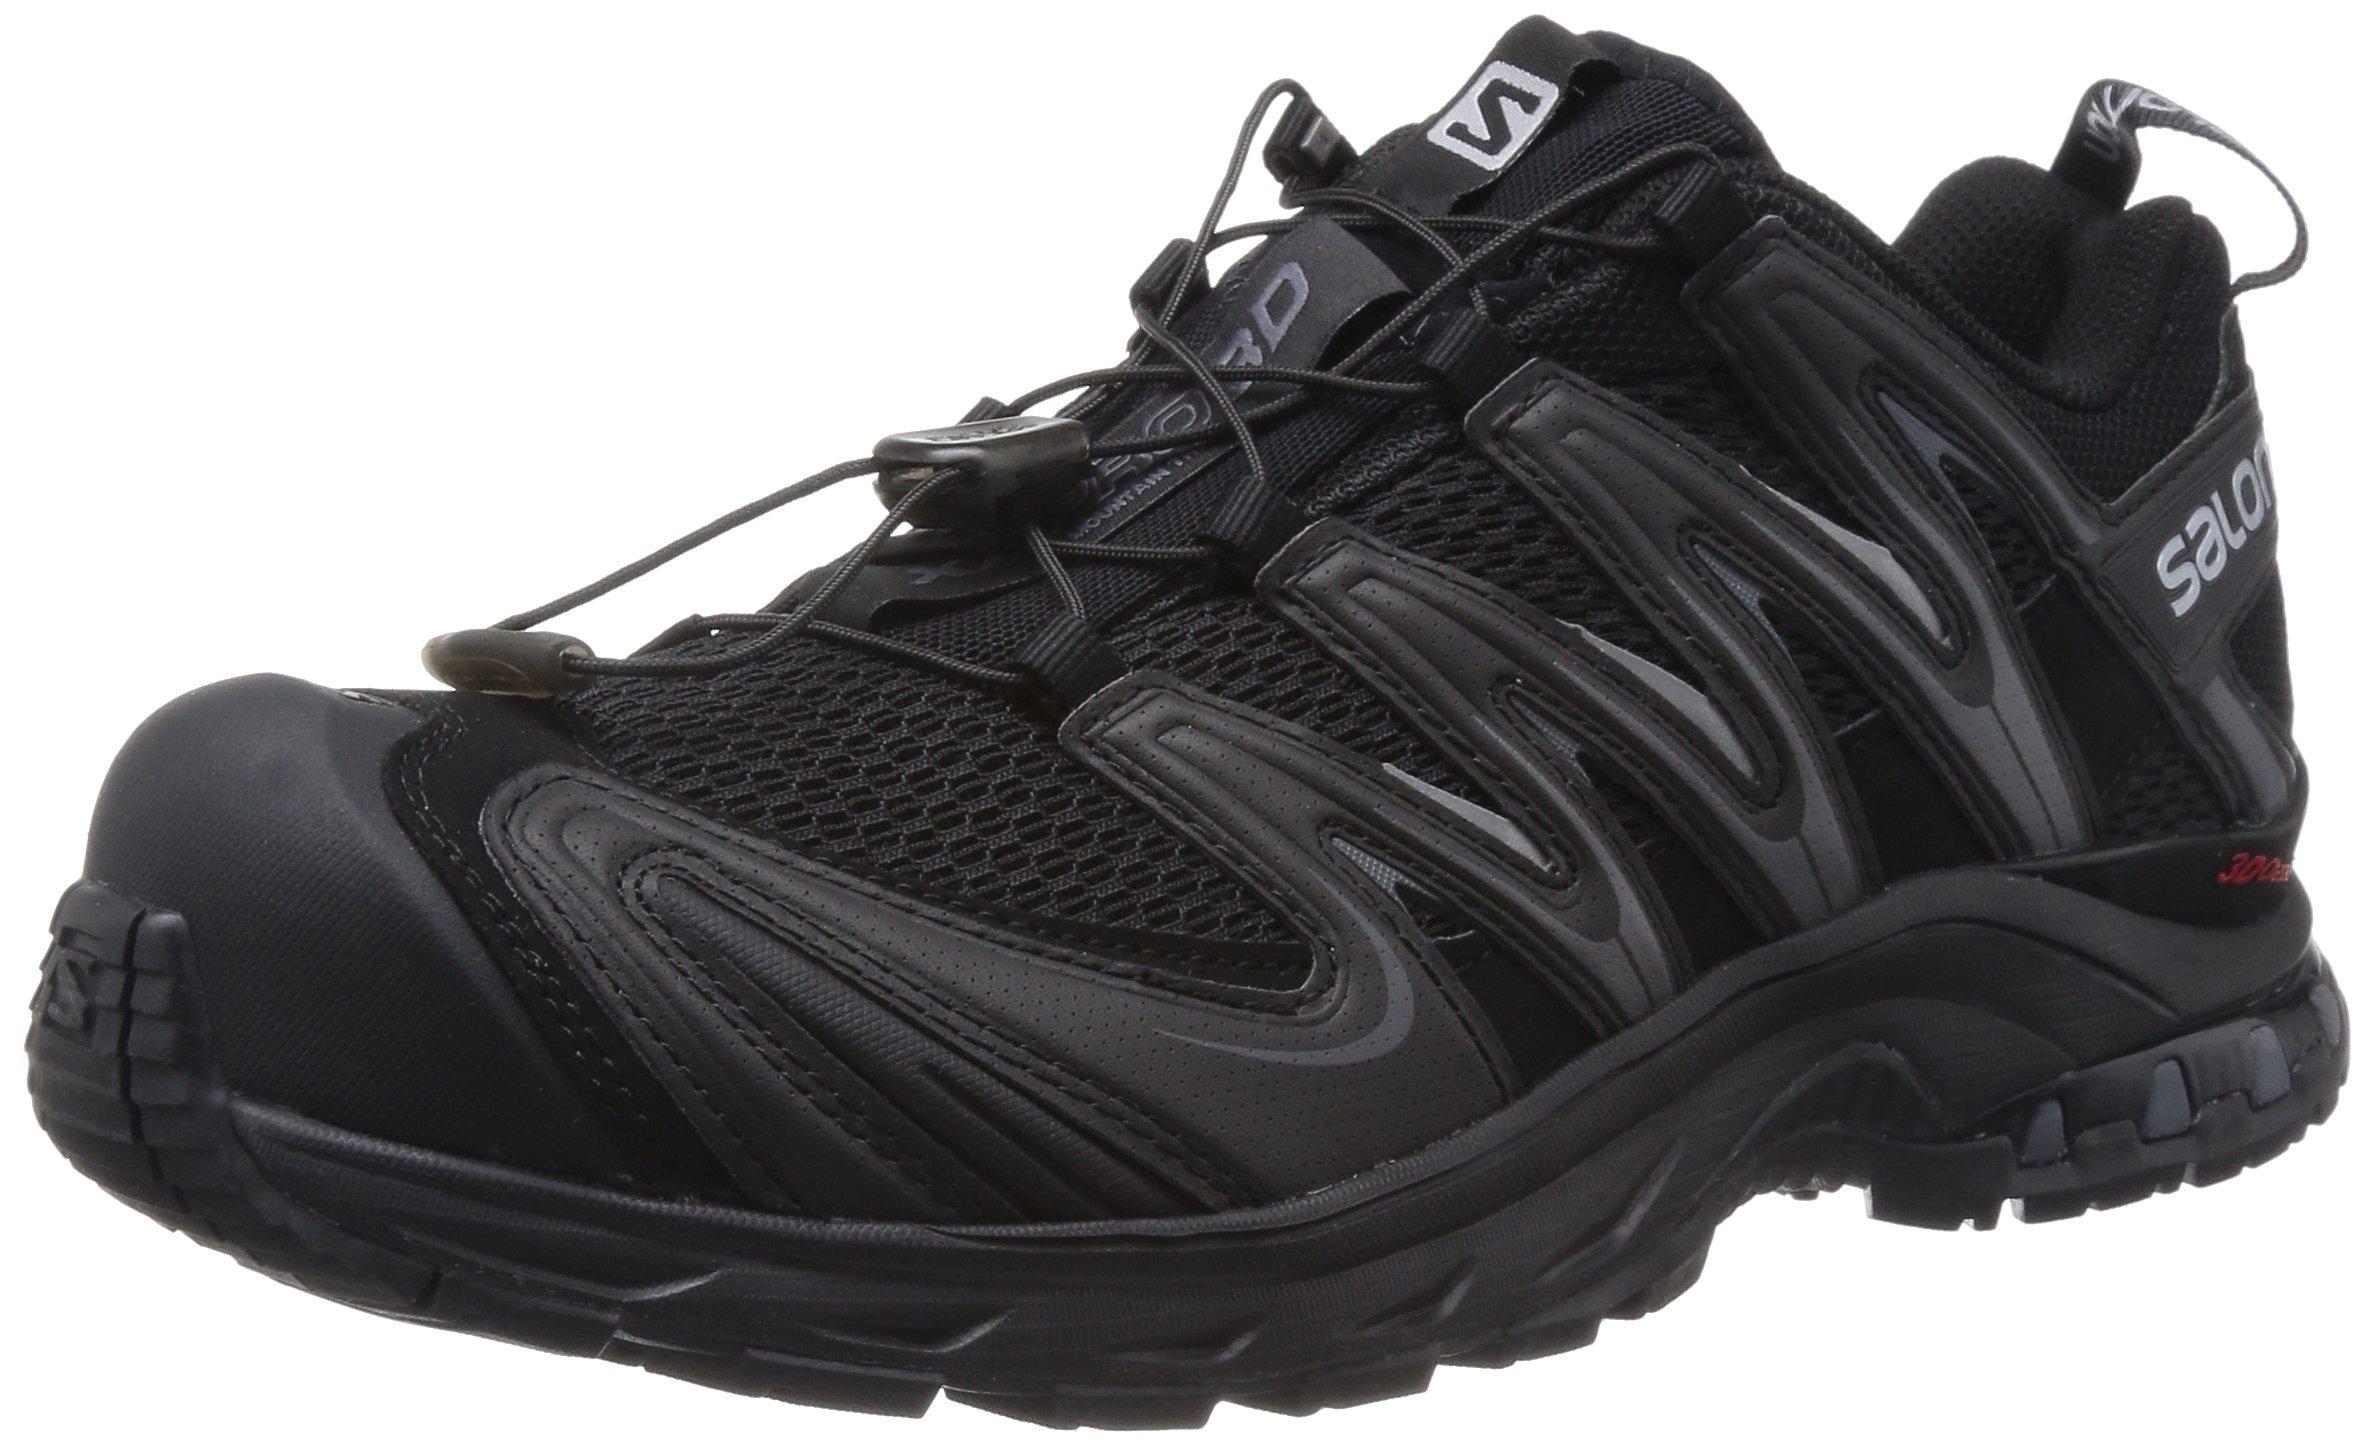 Salomon Men's XA Pro 3D Trail Running Shoe,Black/Black/Dark Cloud,8.5 M US